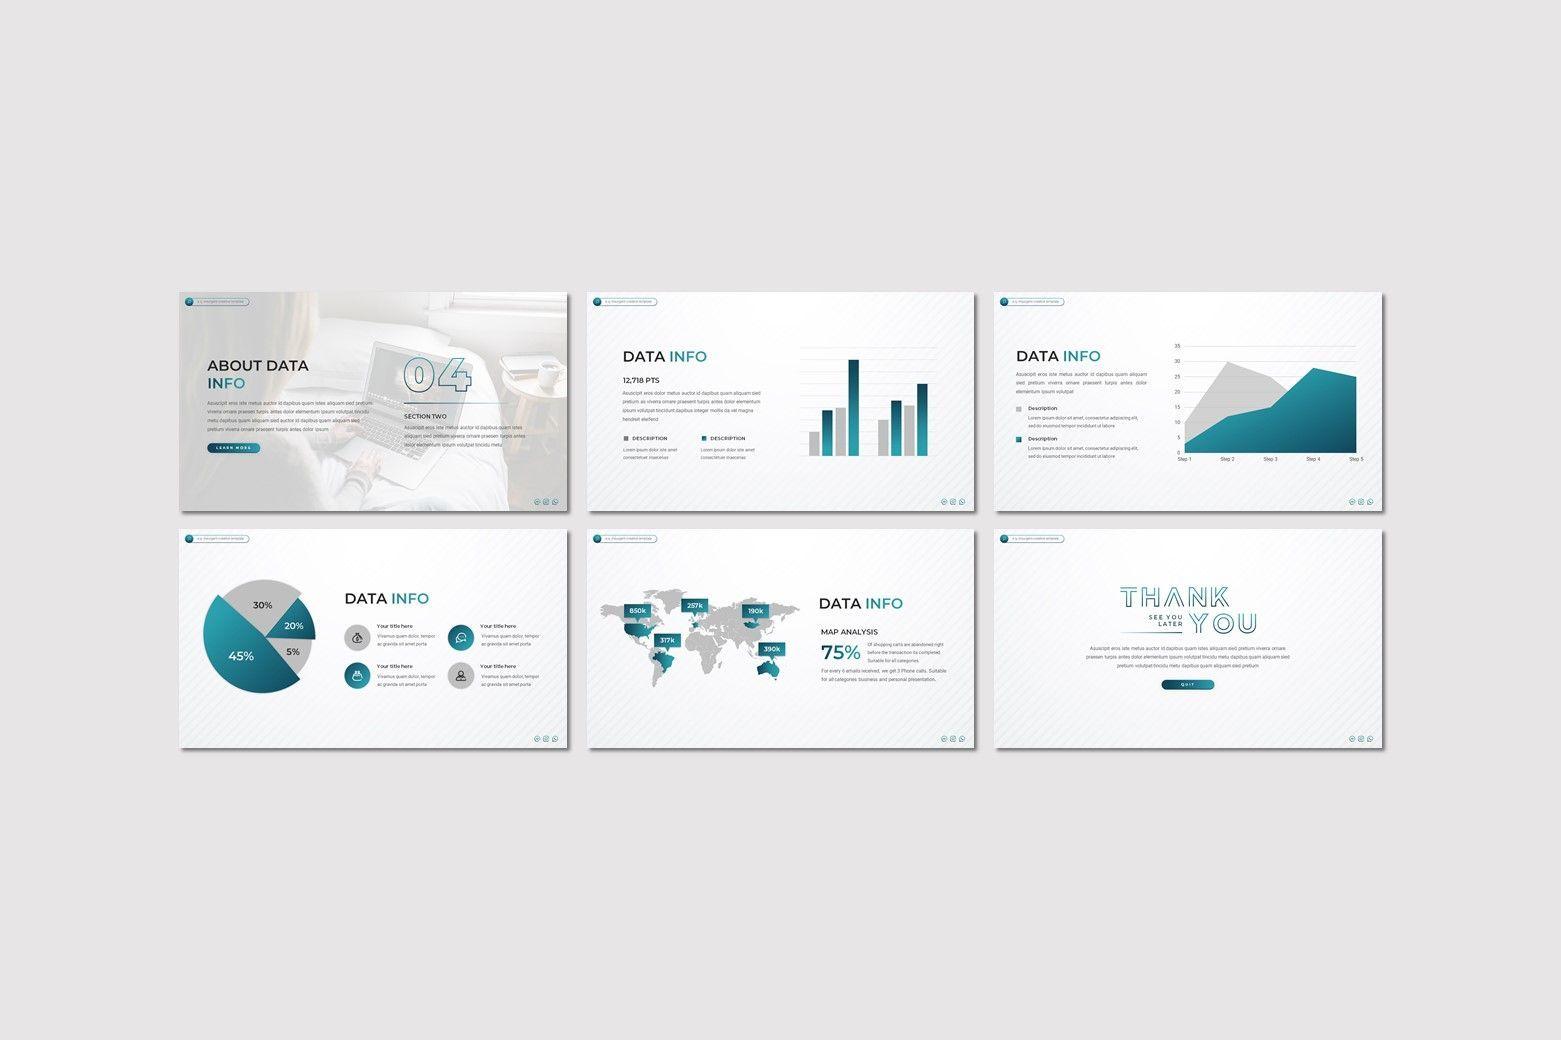 Insurgent - Google Slides Template, Slide 4, 07824, Presentation Templates — PoweredTemplate.com